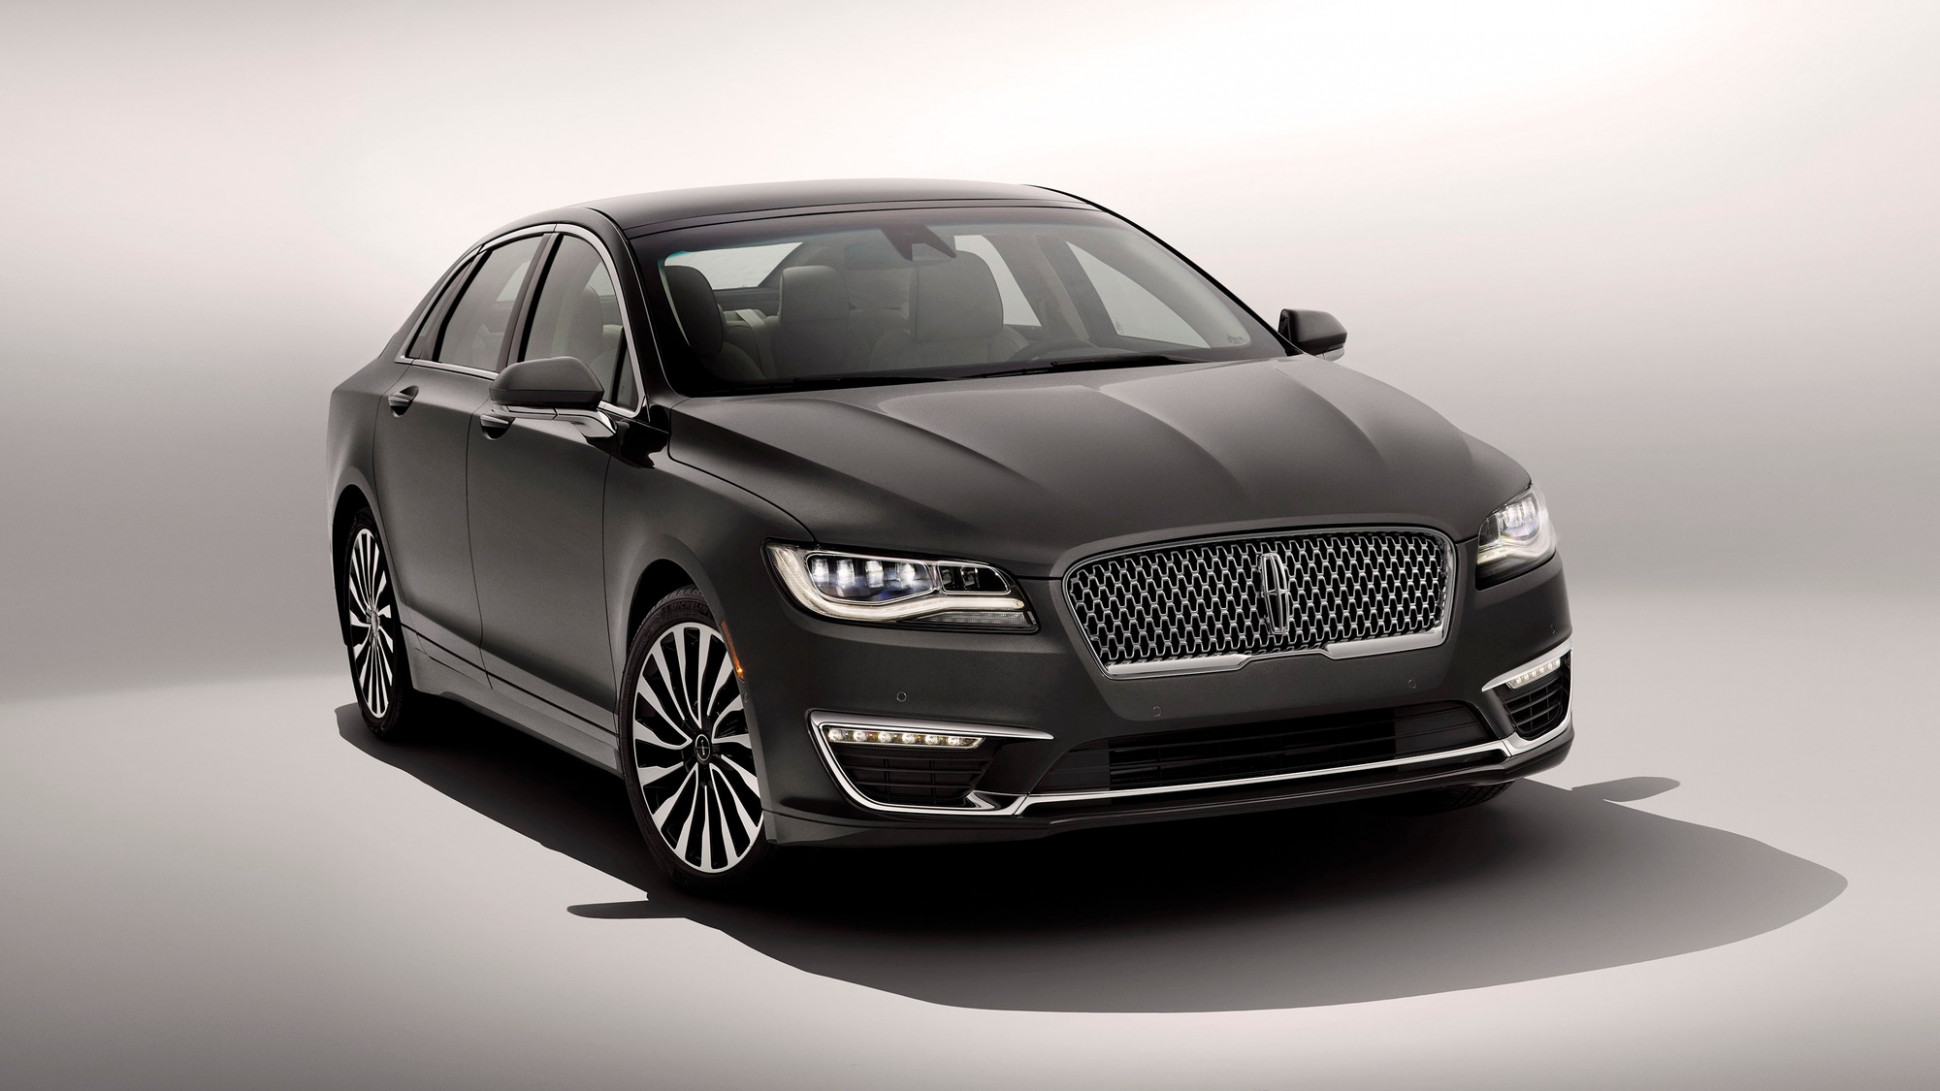 Redesign Spy Shots Lincoln Mkz Sedan